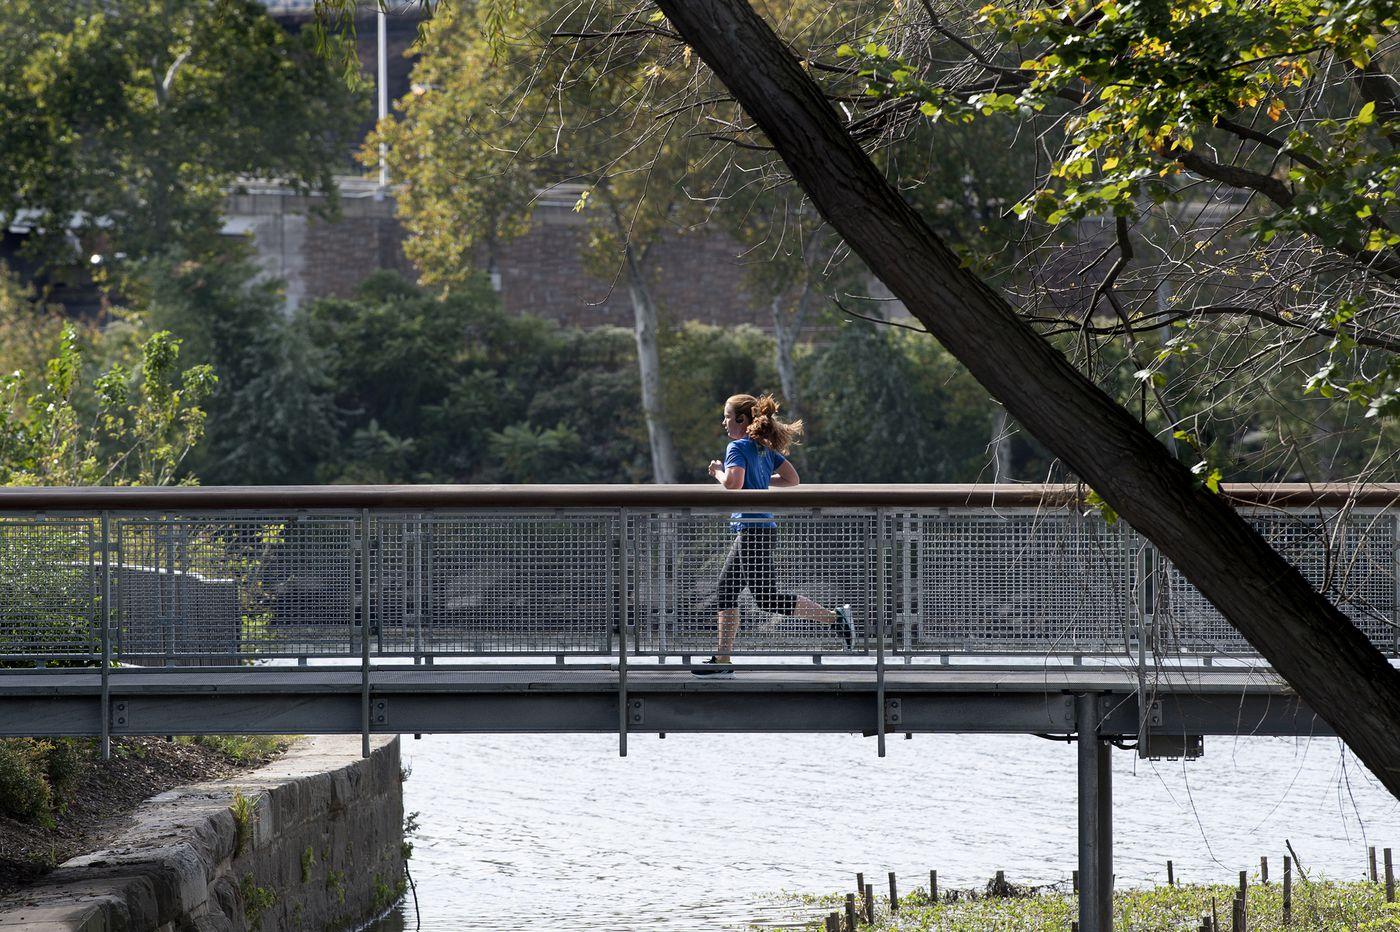 New boardwalk on Schuylkill overlooks Water Works, Boathouse Row